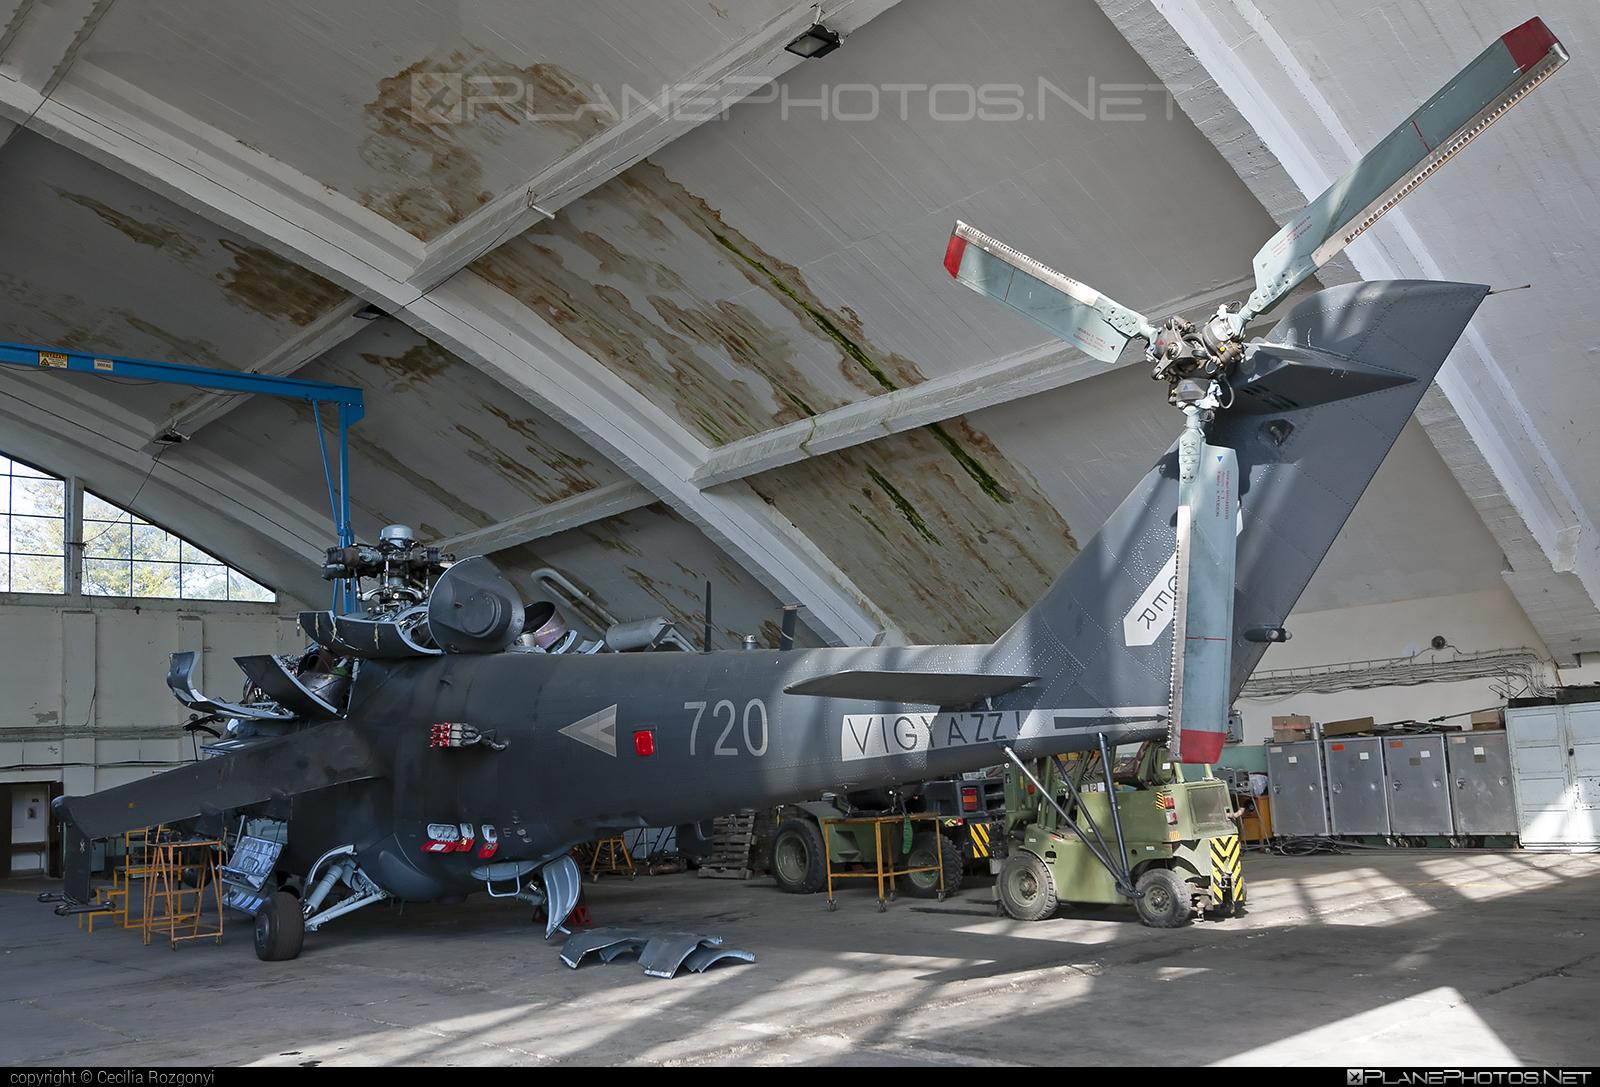 Mil Mi-24V - 720 operated by Magyar Légierő (Hungarian Air Force) #hungarianairforce #magyarlegiero #mi24 #mi24v #mil #mil24 #mil24v #milhelicopters